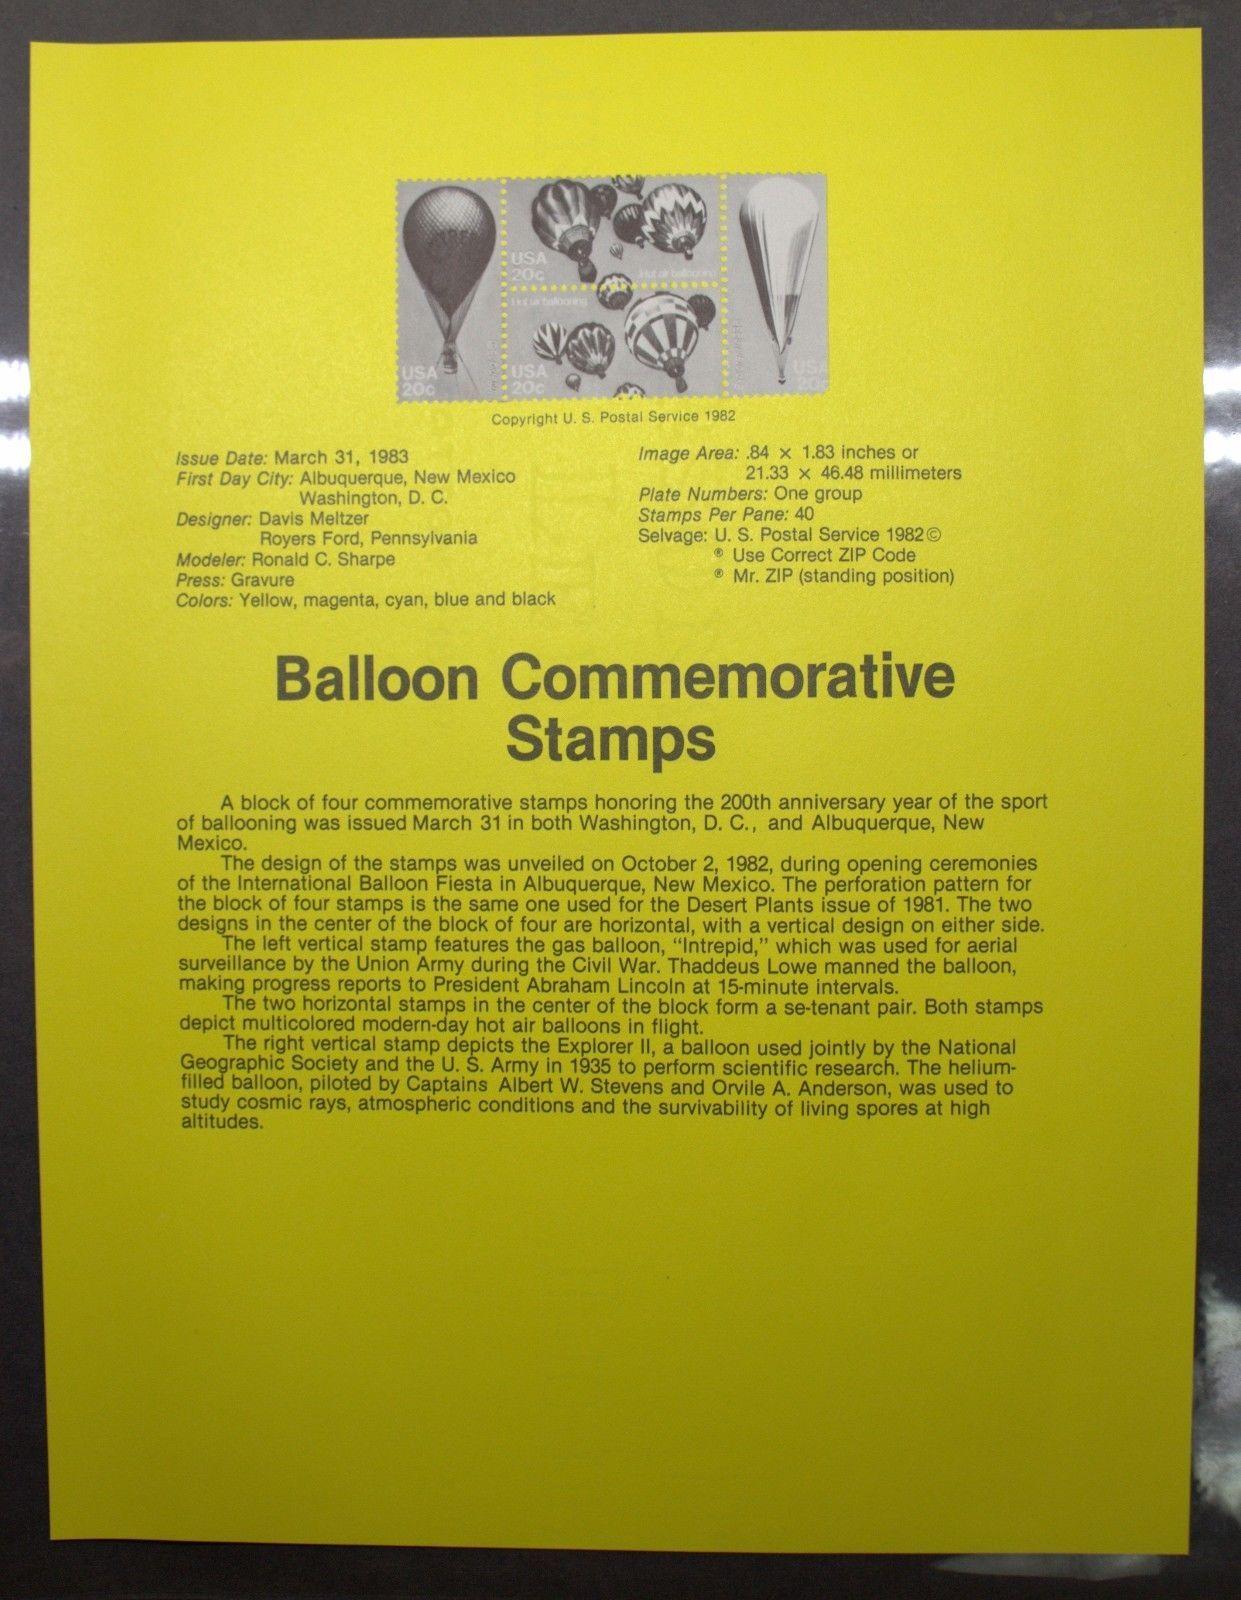 SCOTT 2032-2035 HOT AIR BALLOONING 1983   SHEET OF 40 20 CENT STAMPS #59588-3DBW